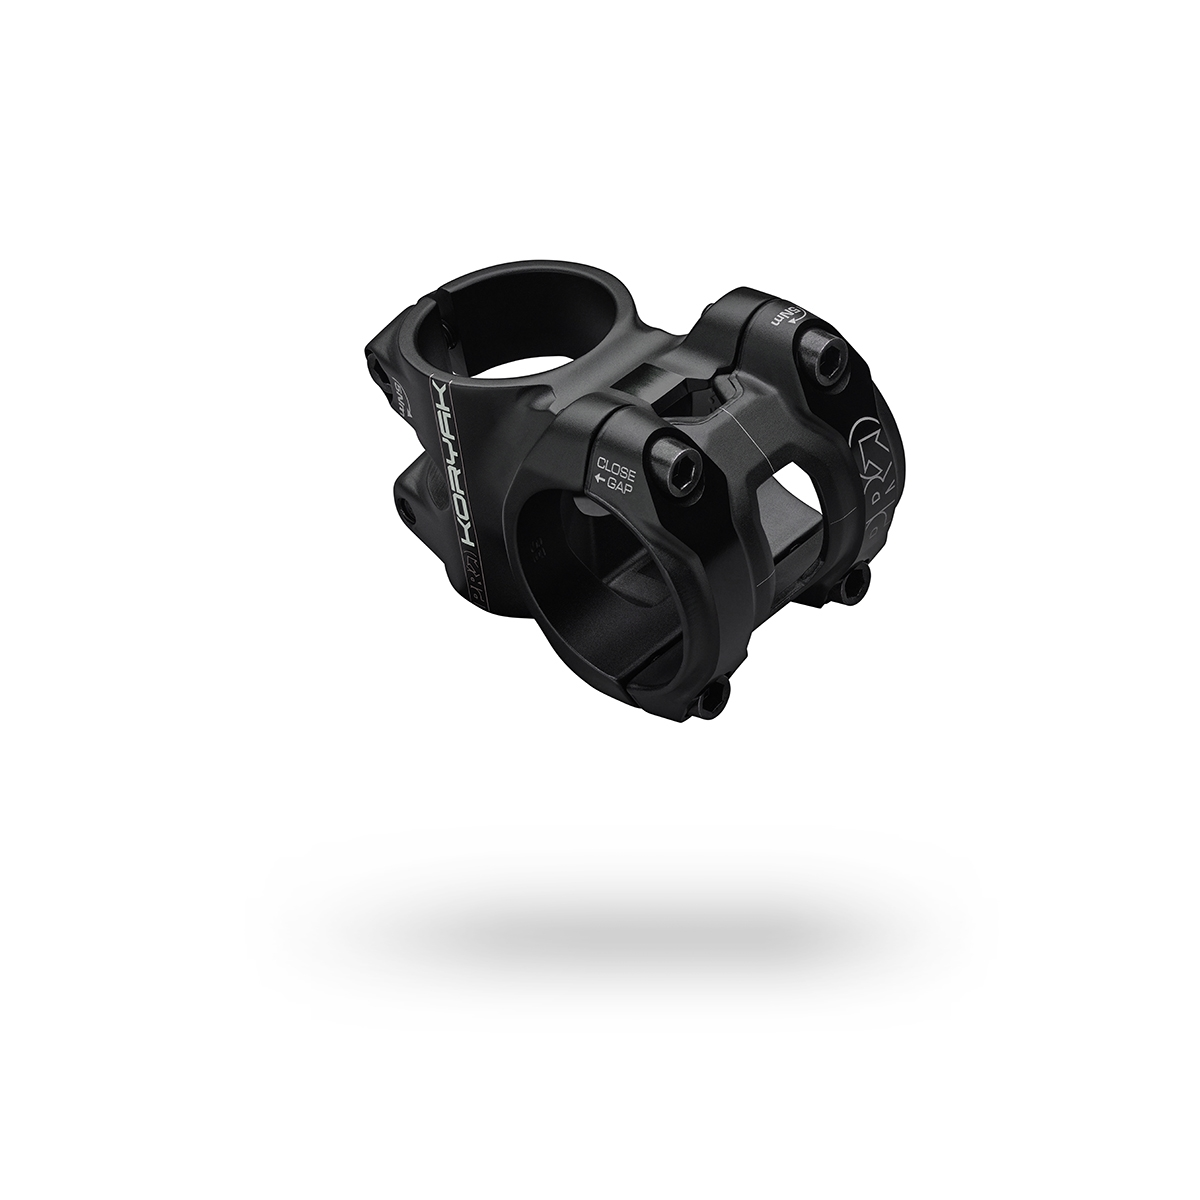 Stem Koryak 31.8mm x 50mm 0° Black